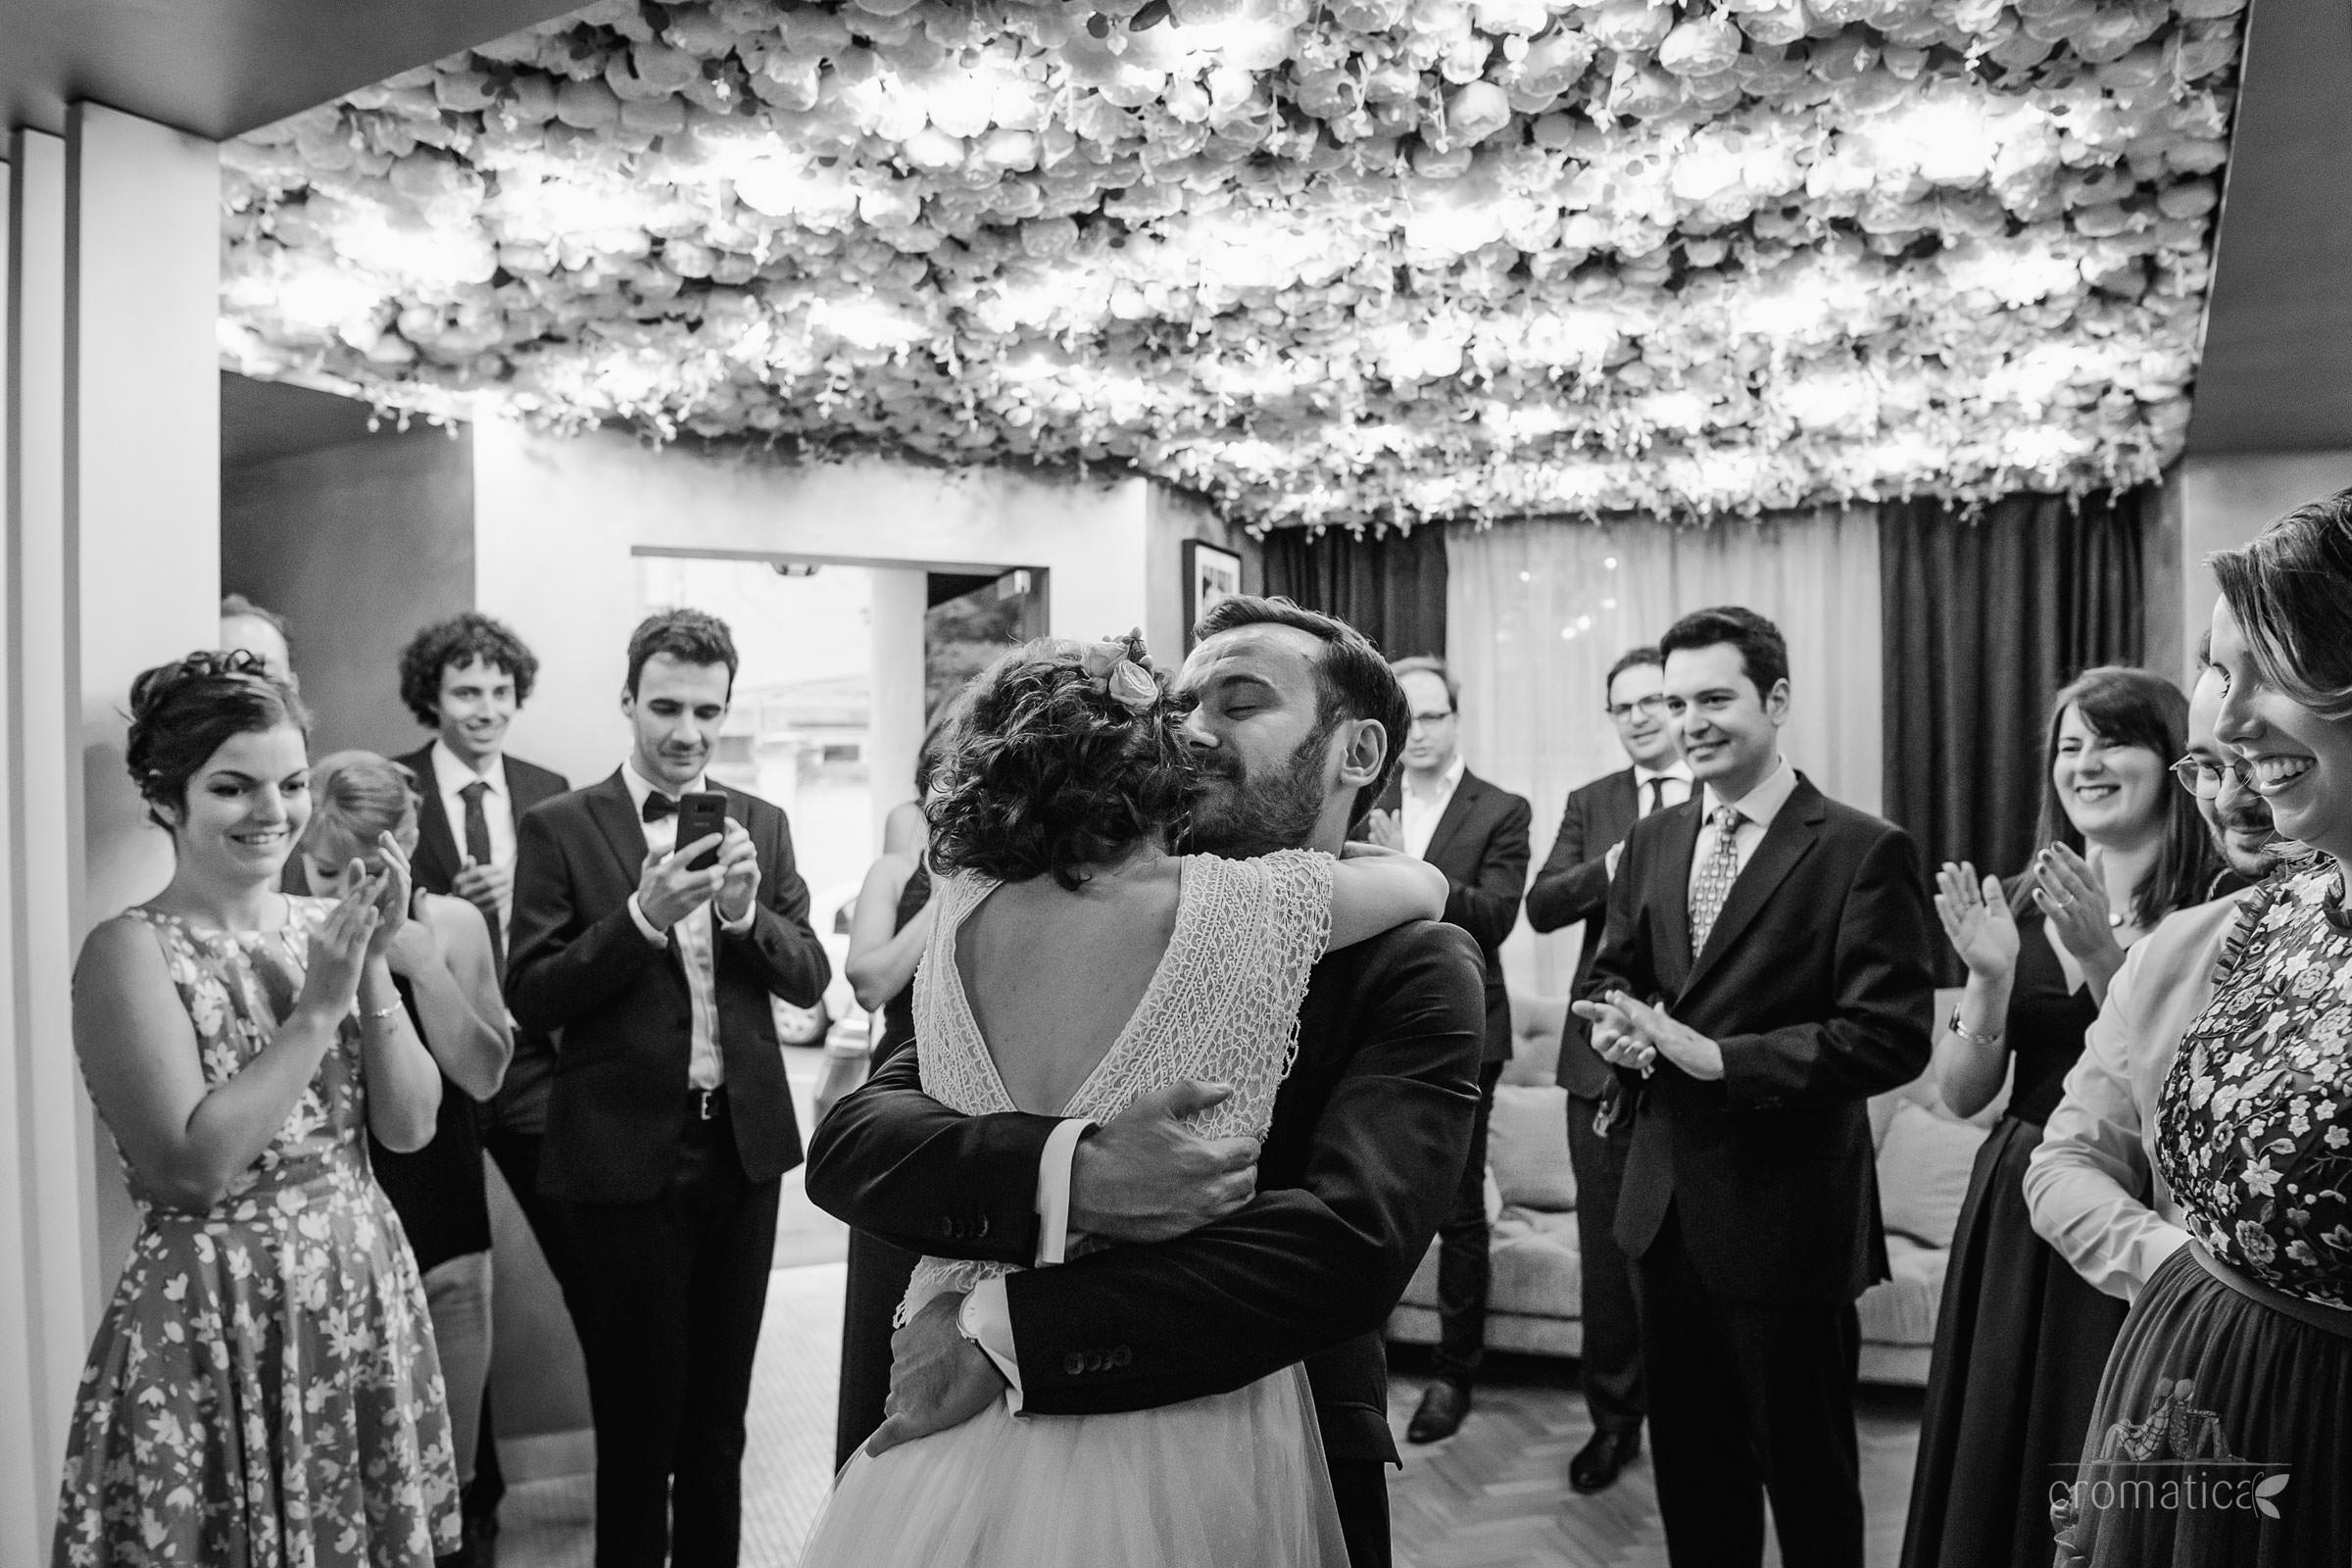 roxana mihai fotografii nunta la seratta 030